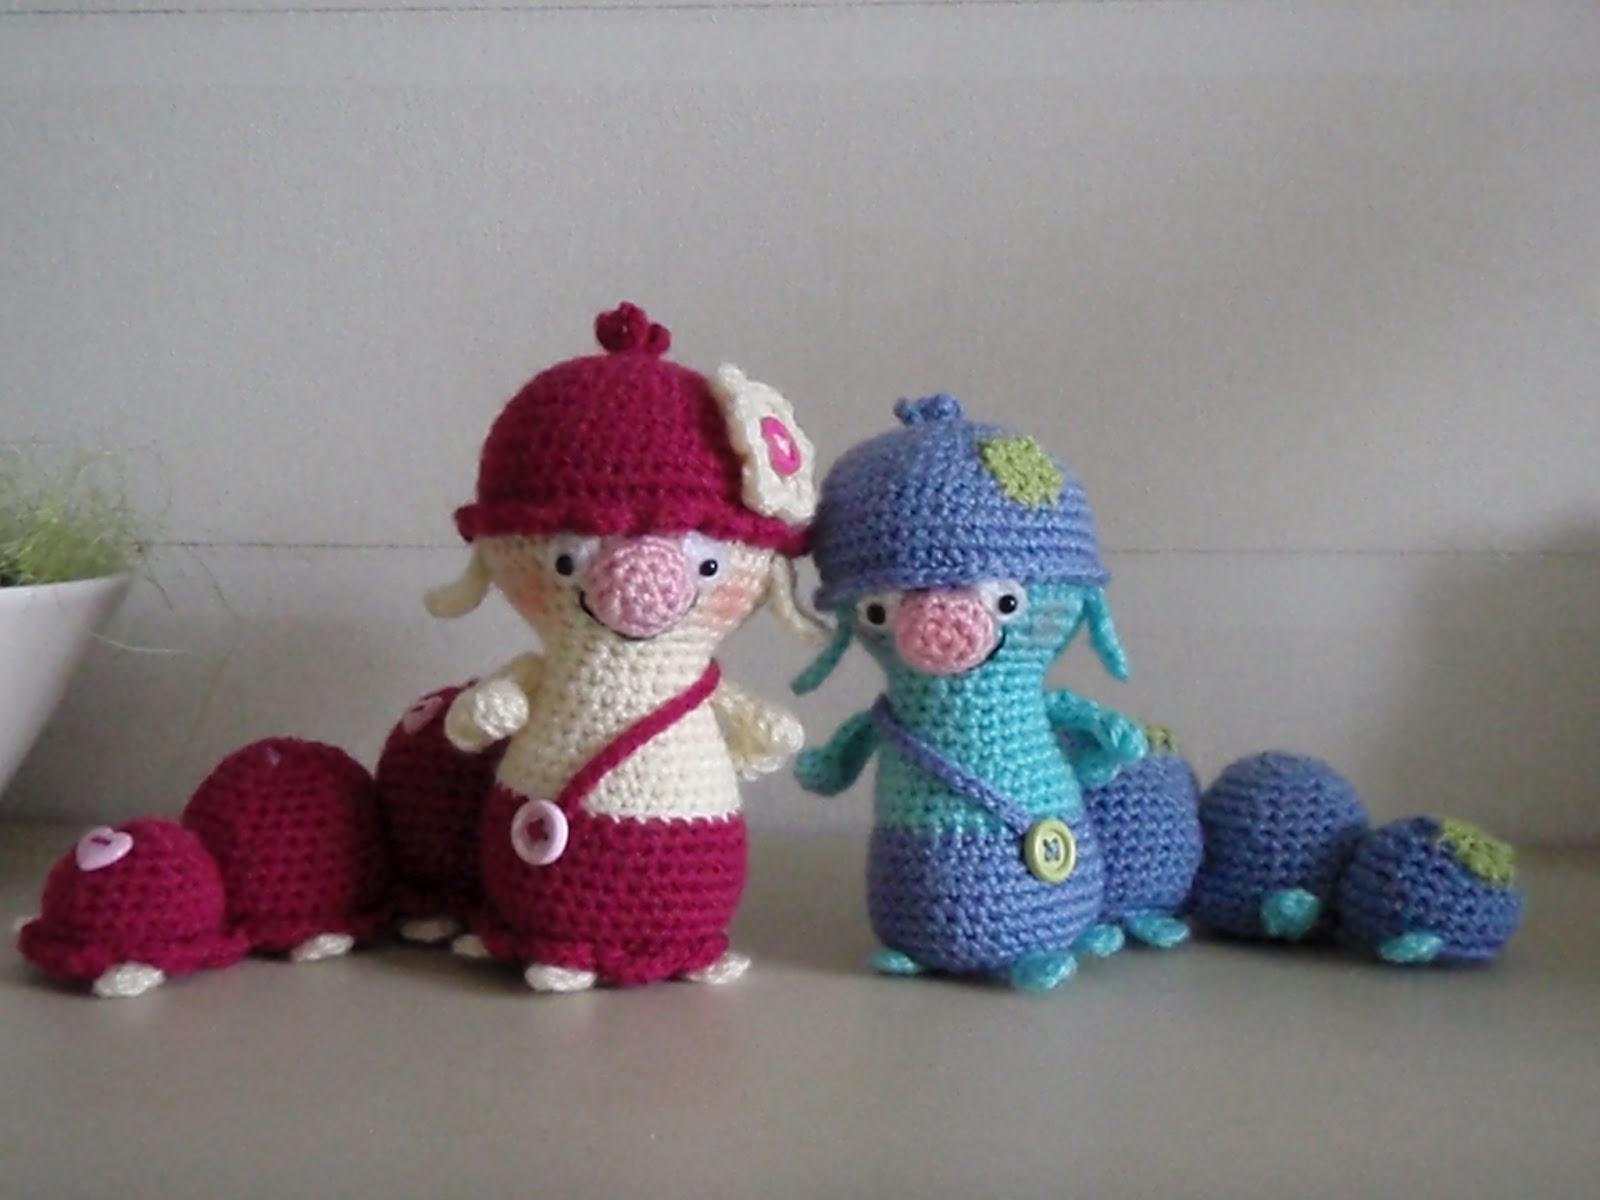 Ladybird et Bourdon CREME OEUF COUVRE Knitting Pattern